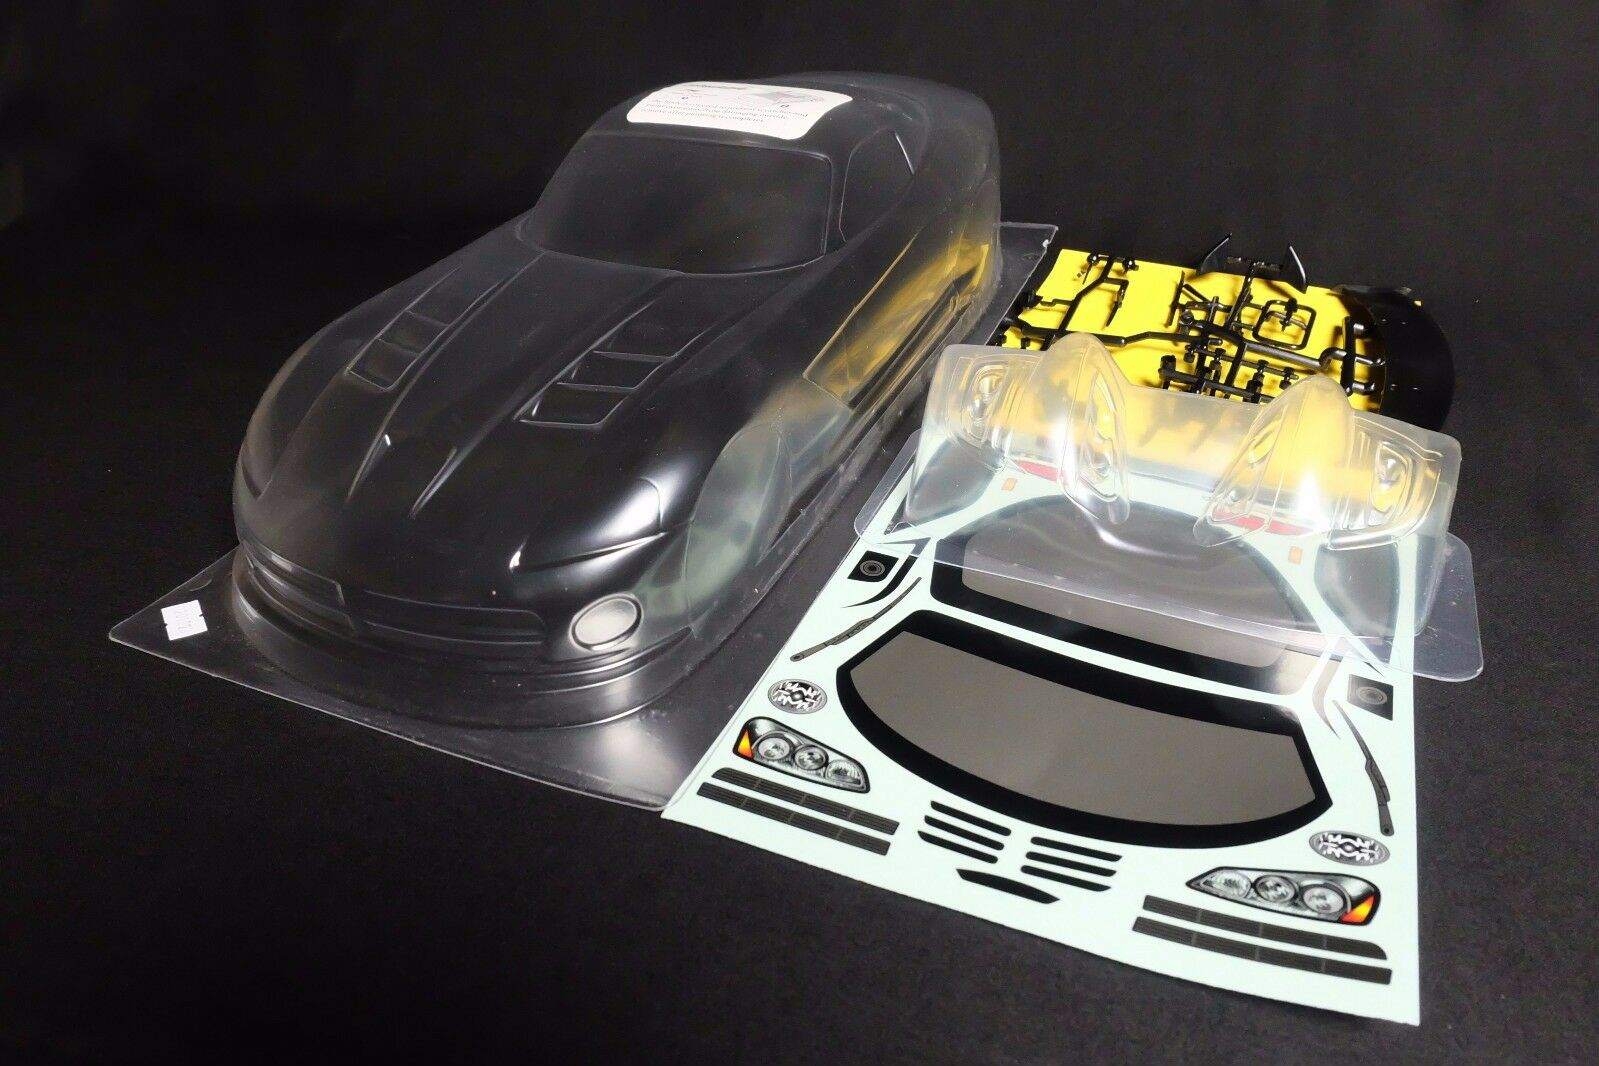 1//10 RC Car Lexan Body Clear Shell Dodge Viper SRT10 fit Tamiya Yokomo Chassis